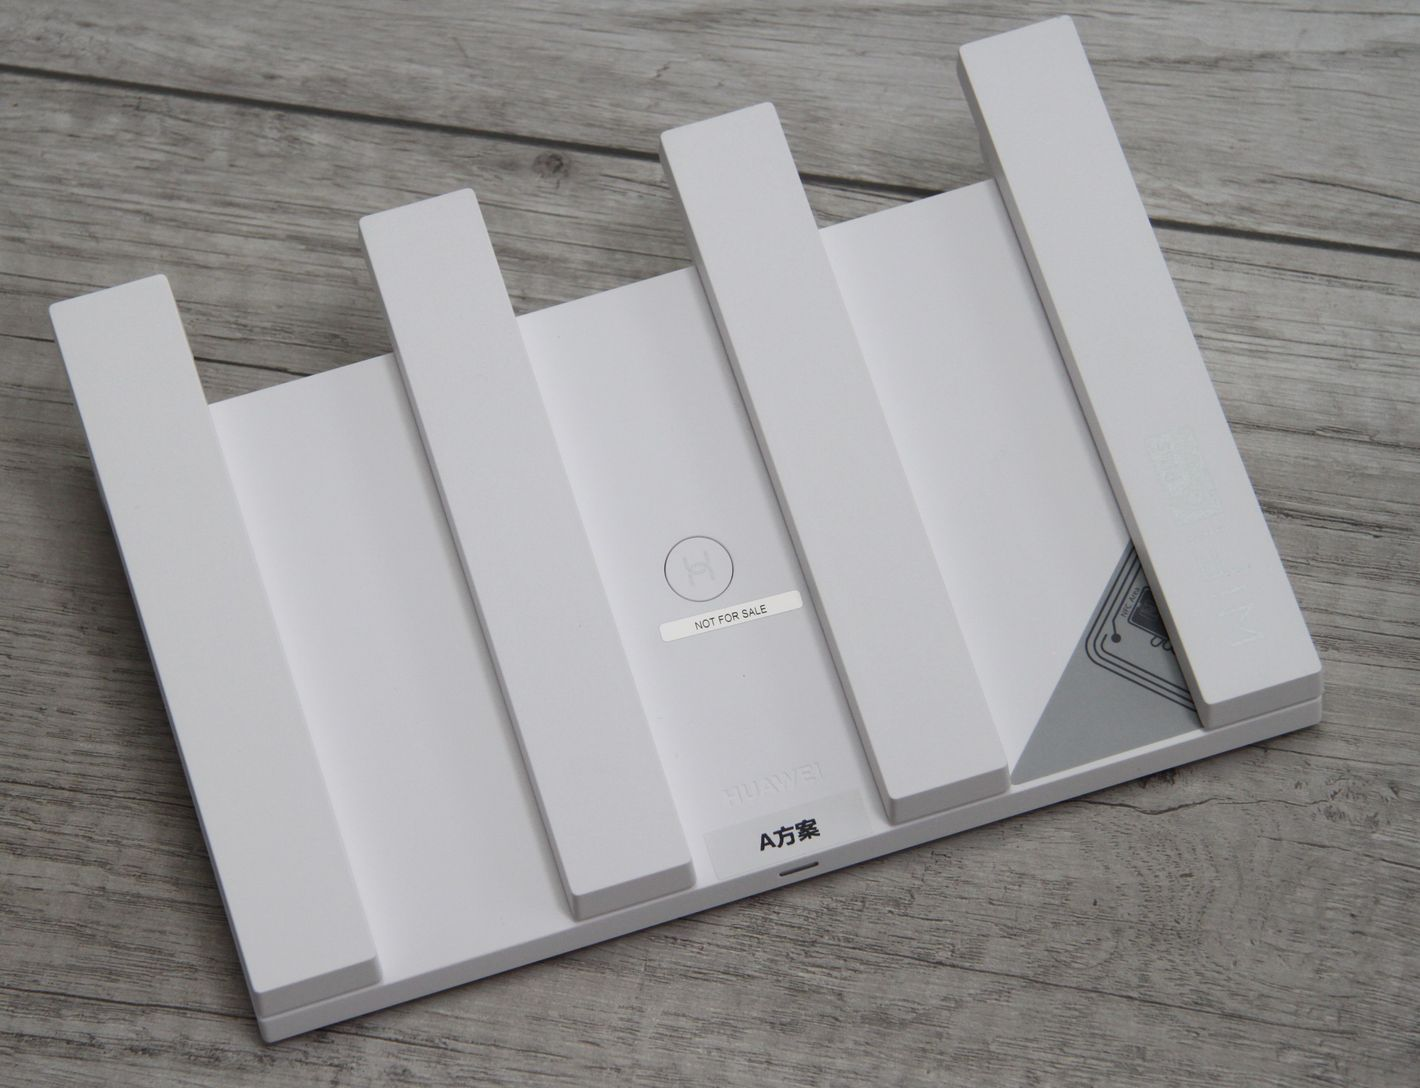 Huawei WiFi AX3 Quad core router